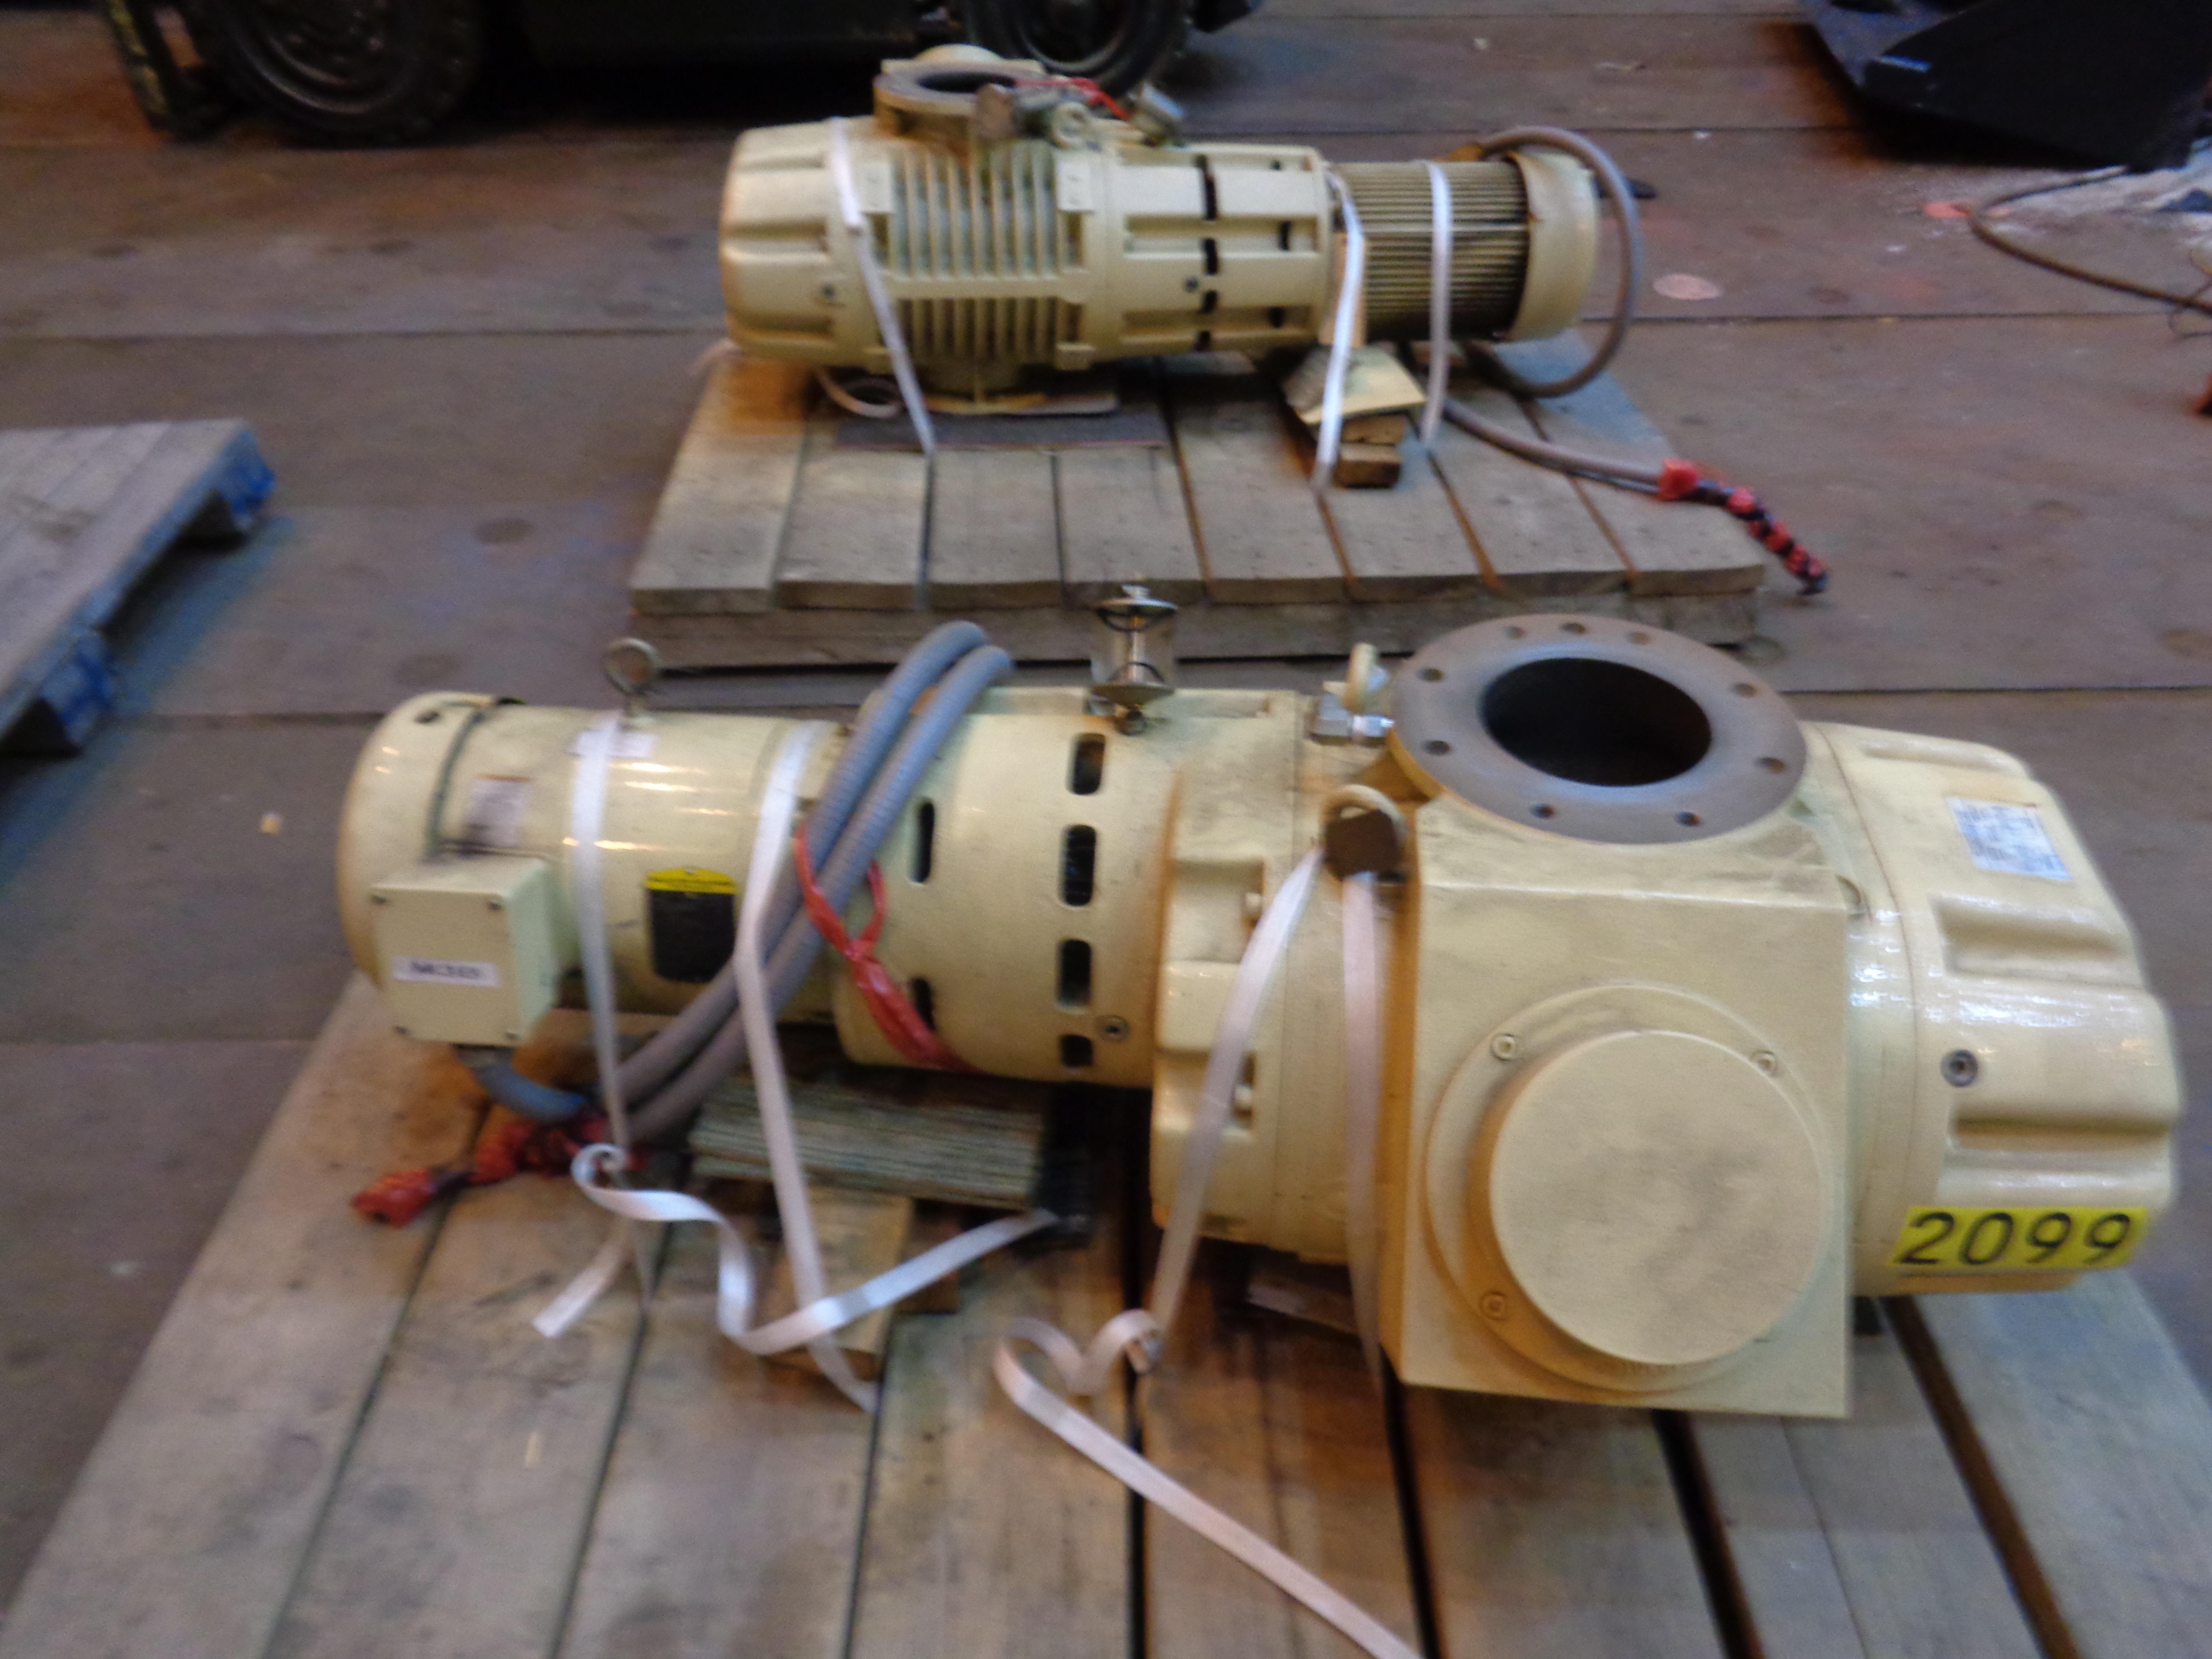 Lot of 3 Vacuum Pumps - Image 7 of 26